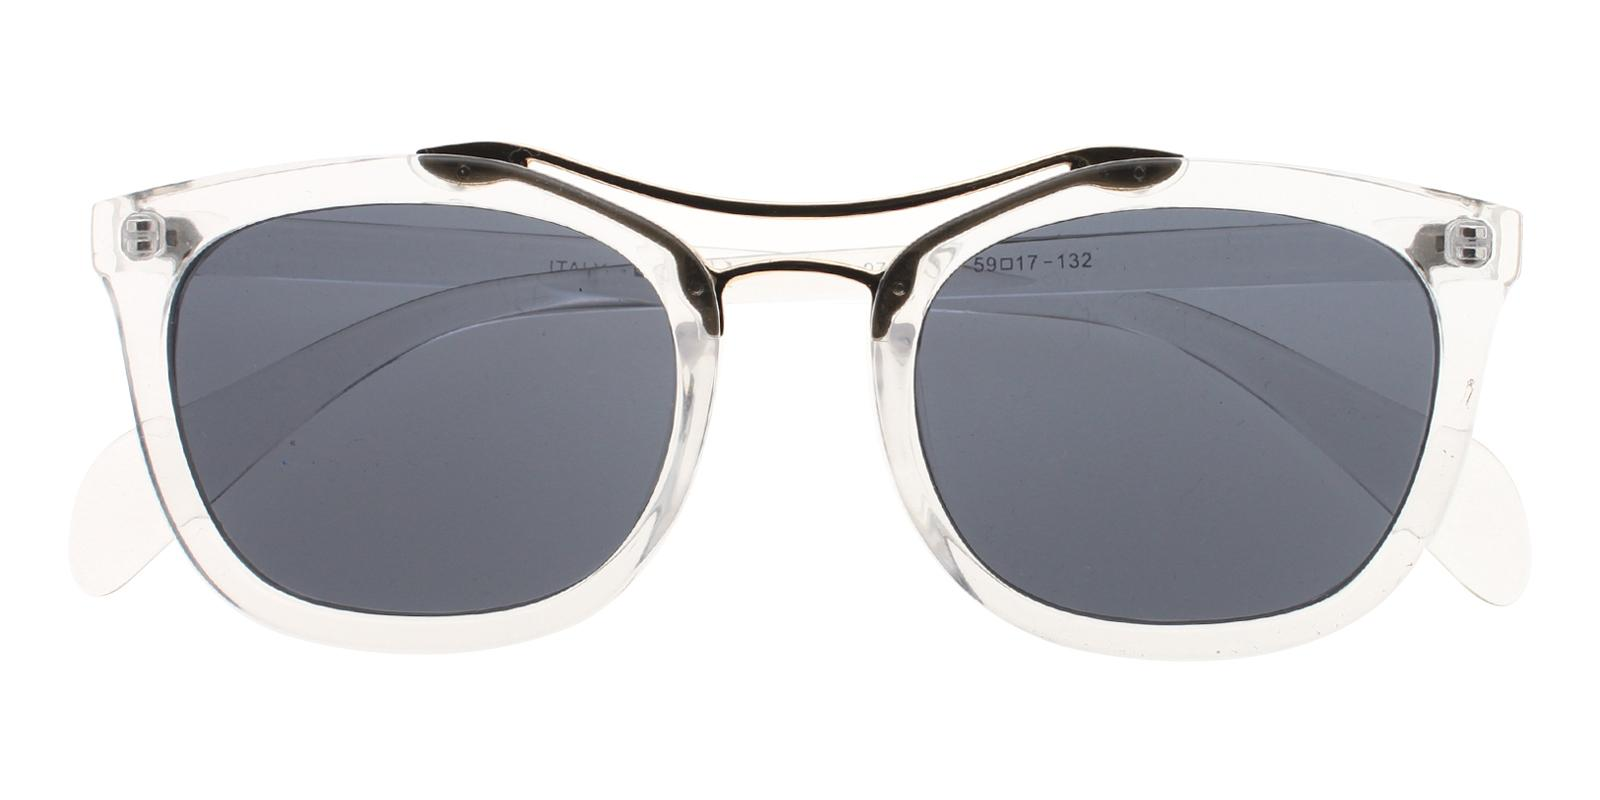 Minden Translucent Plastic Sunglasses , UniversalBridgeFit Frames from ABBE Glasses